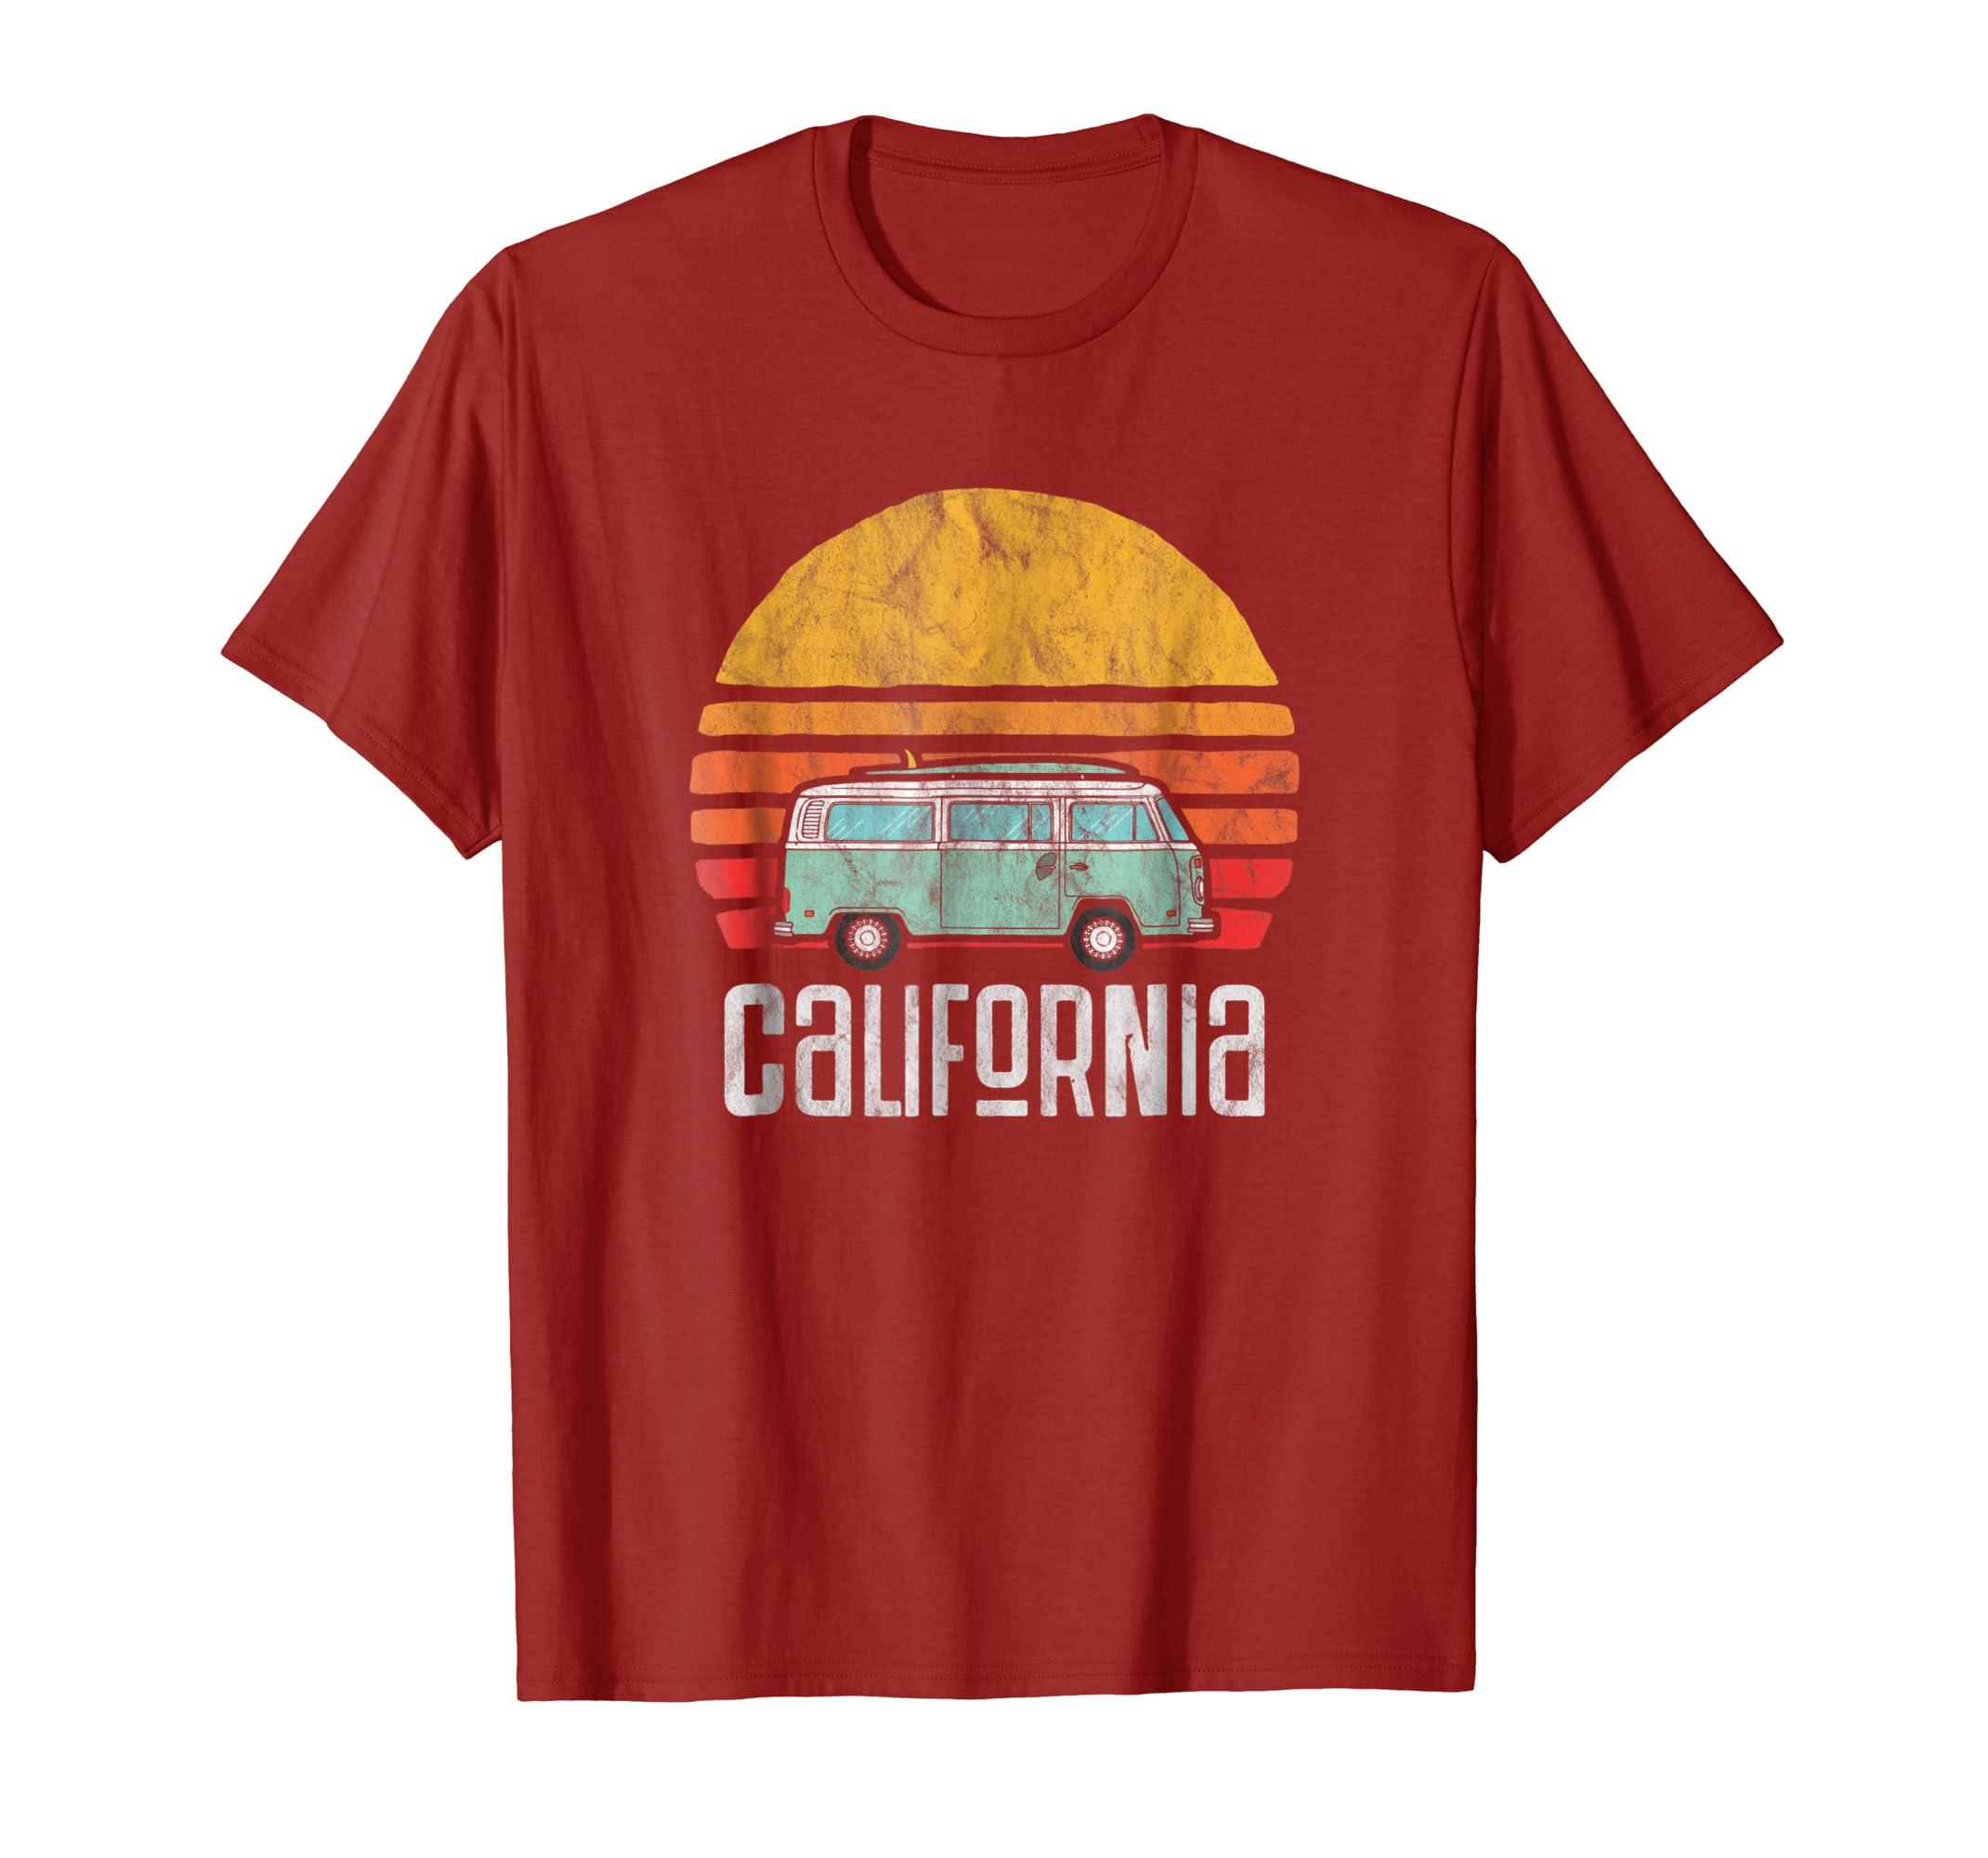 be723fa84a Amazon.com: Retro California Hippie Van Beach Bum Surfer T-Shirt: Clothing